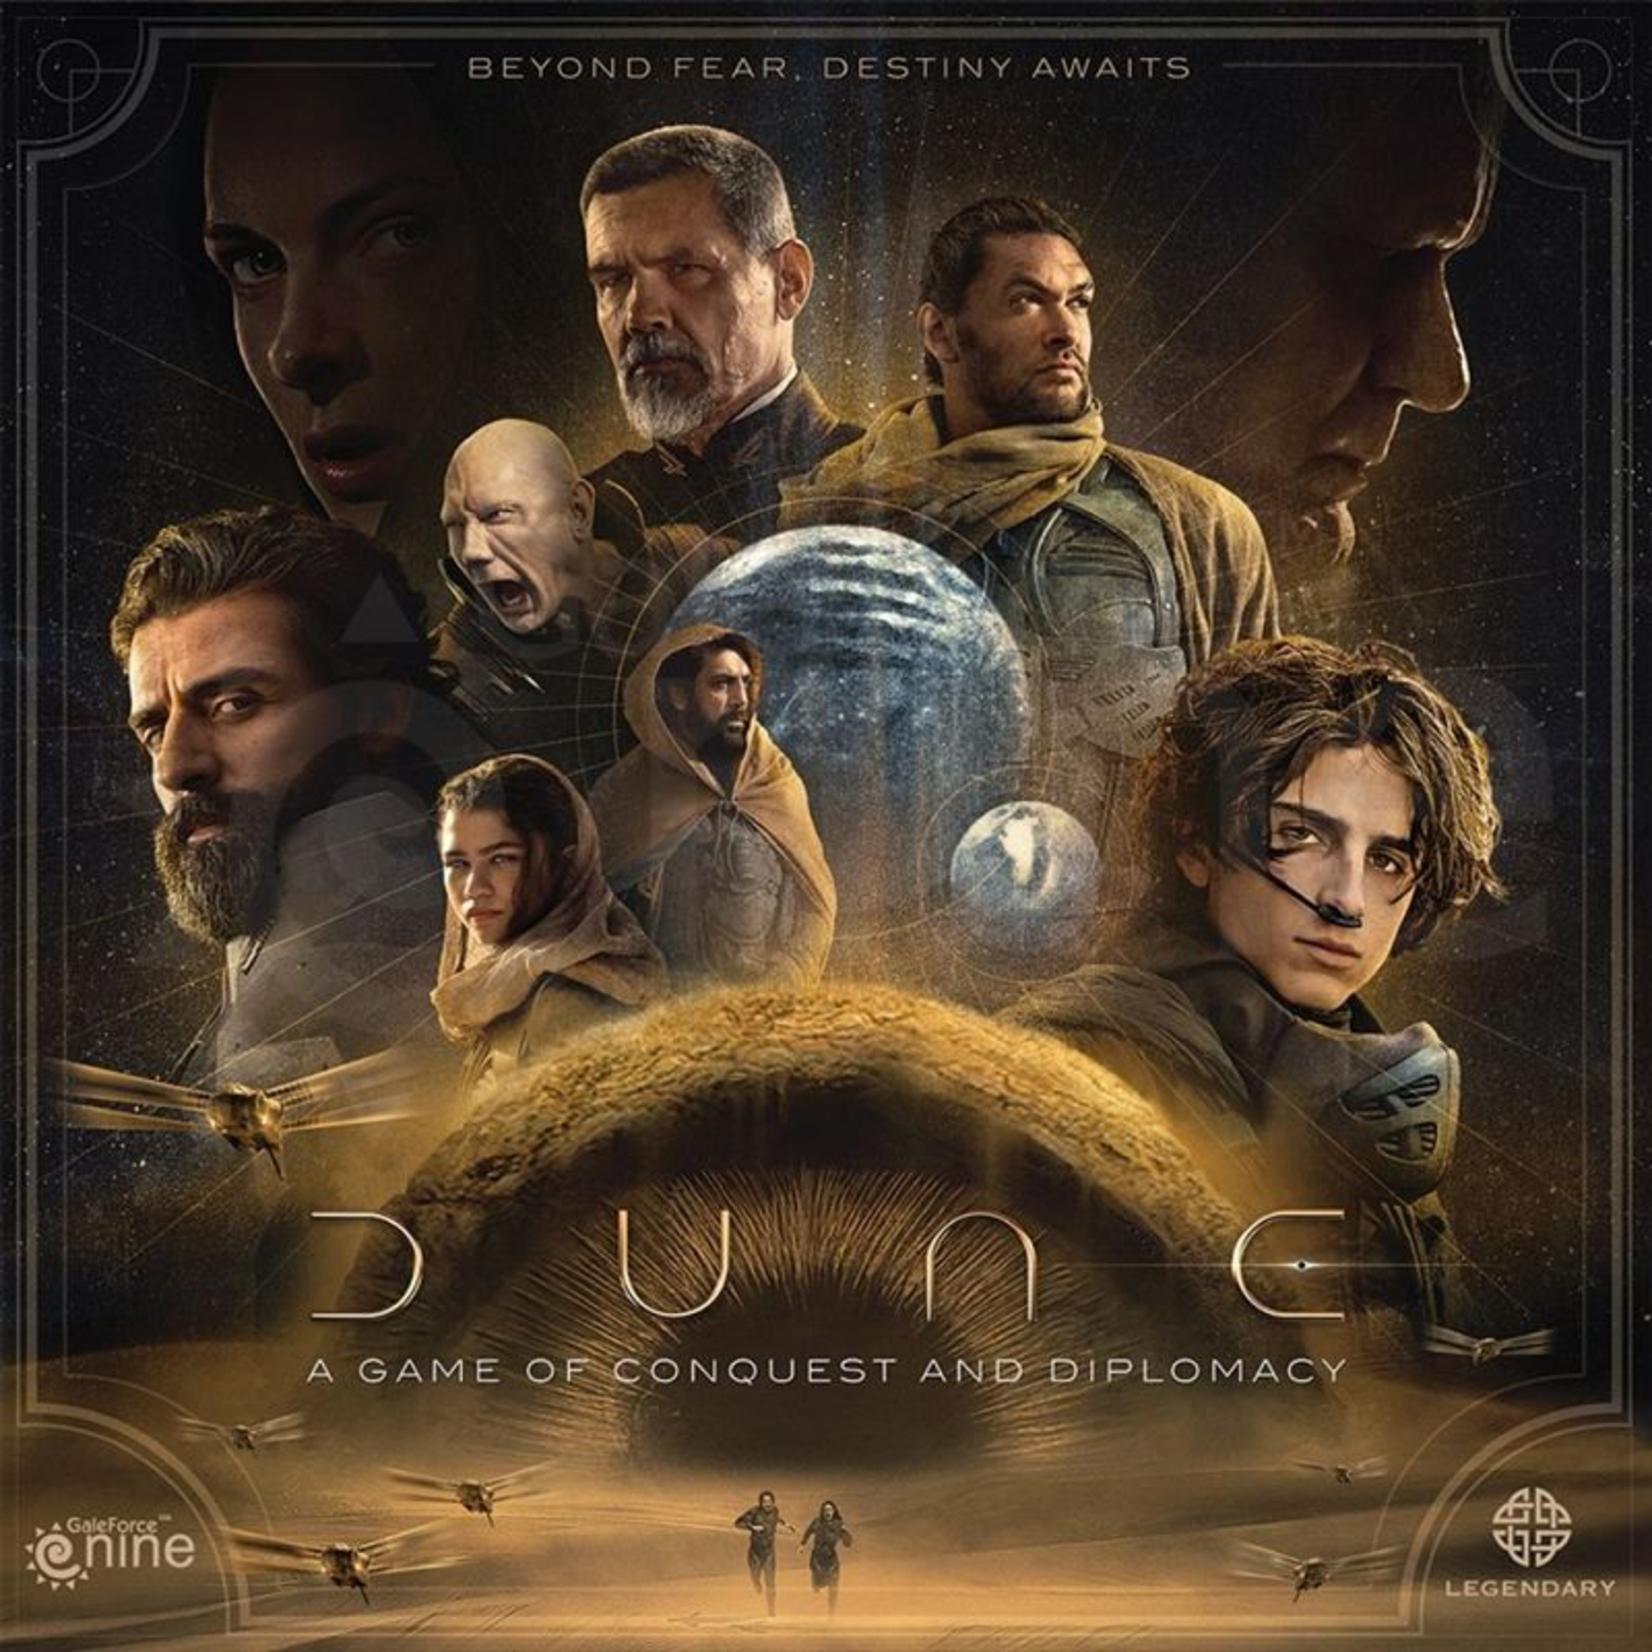 Gale Force Nine Dune (Film Version)